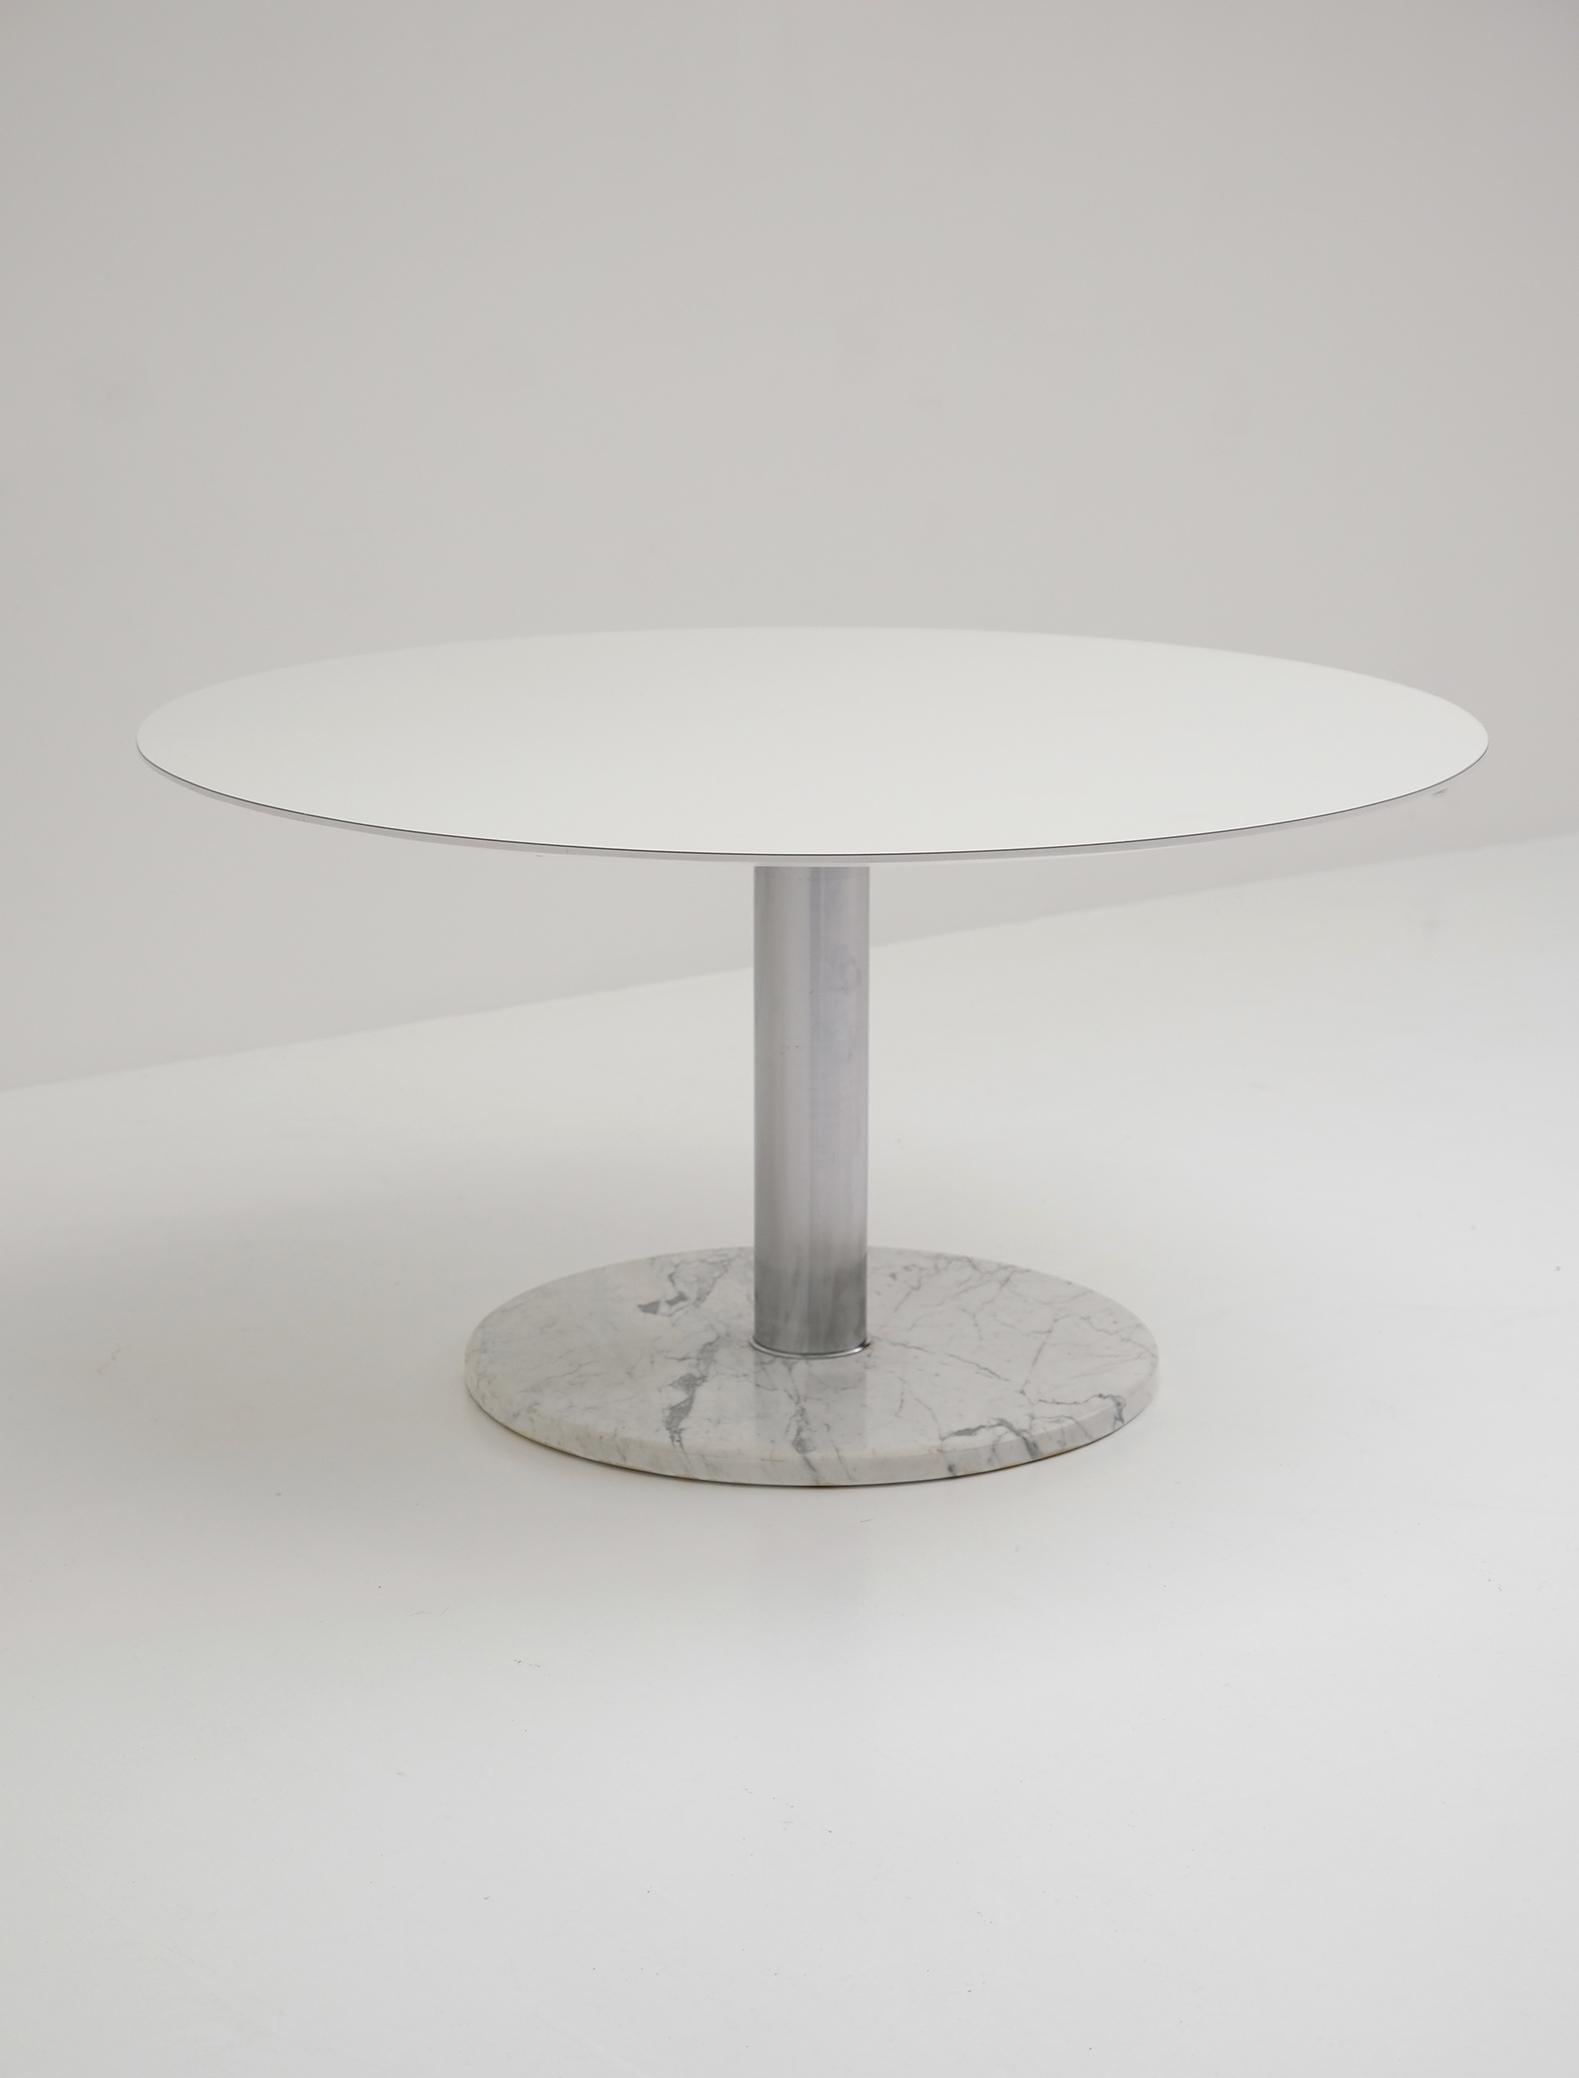 Alfred Hendrickx Round Dining Tableimage 9